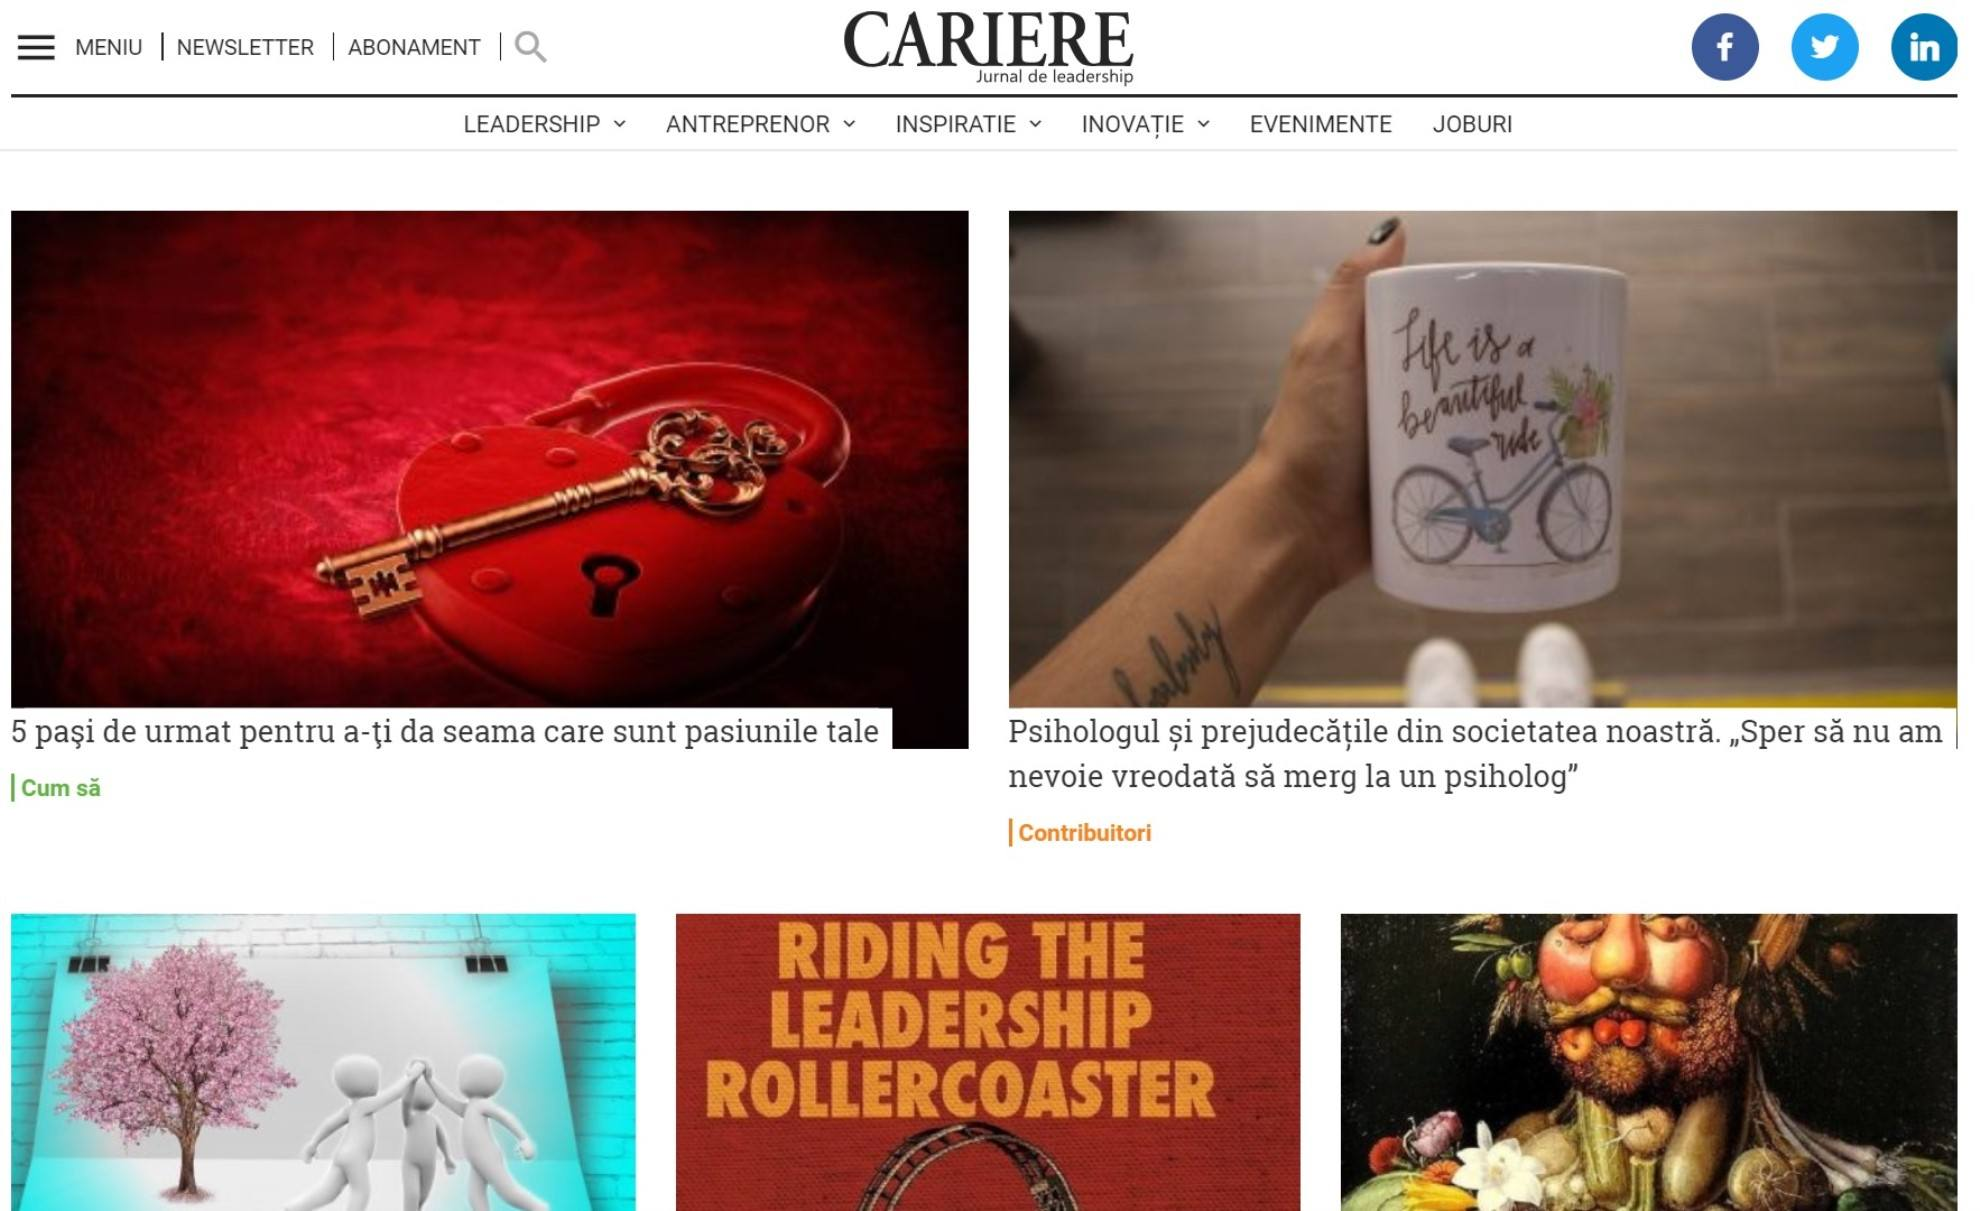 Cariere | Jurnal de leadership